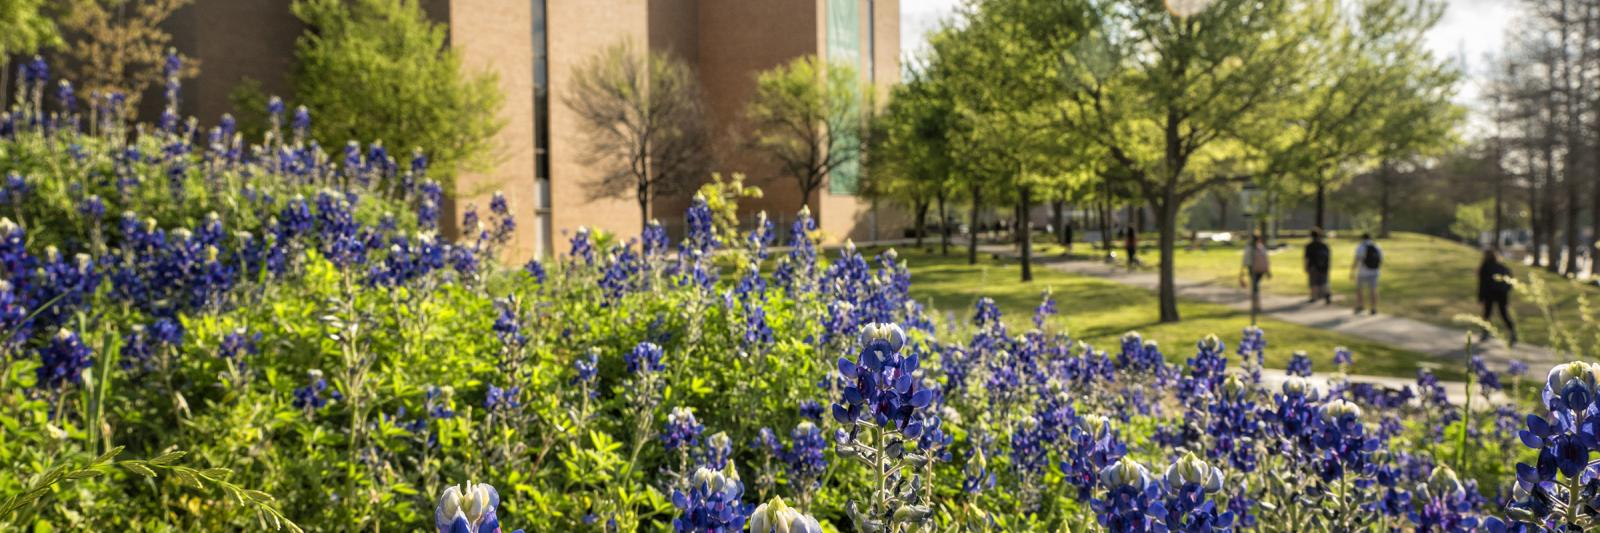 Bluebonnets on the UNT campus